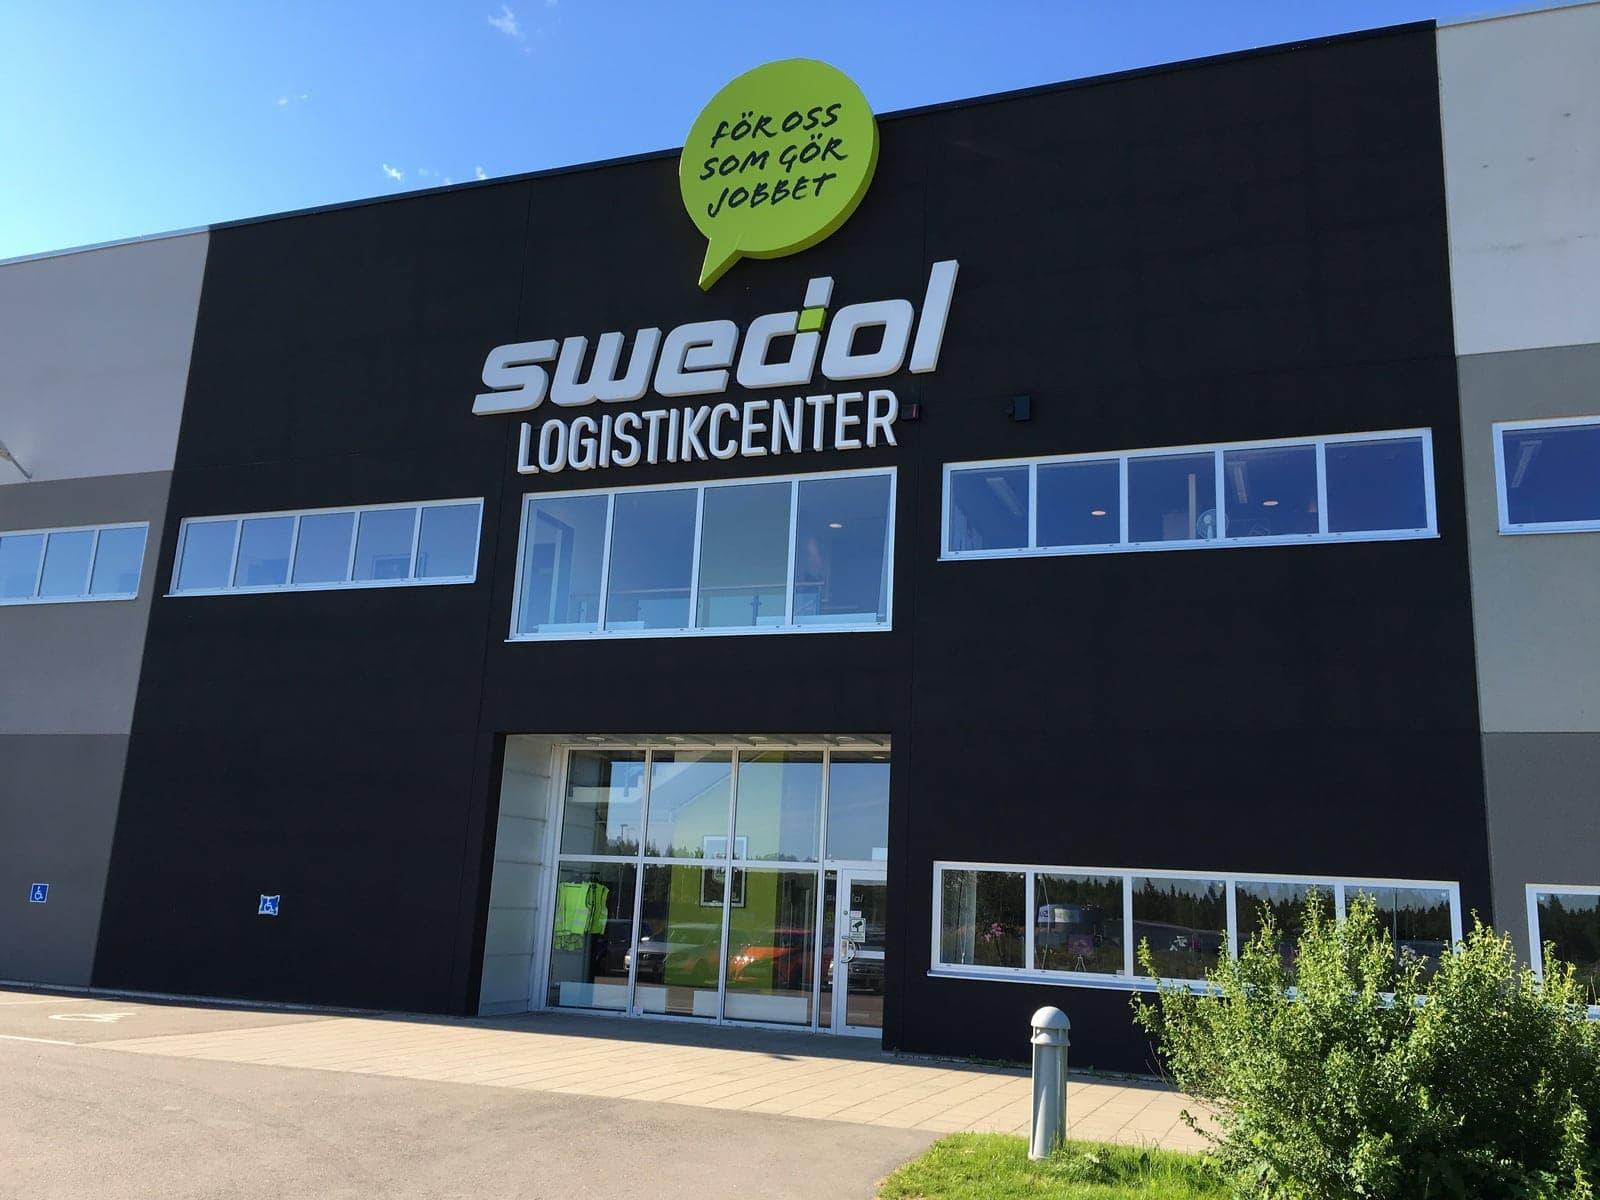 Swedol Logistikcenter